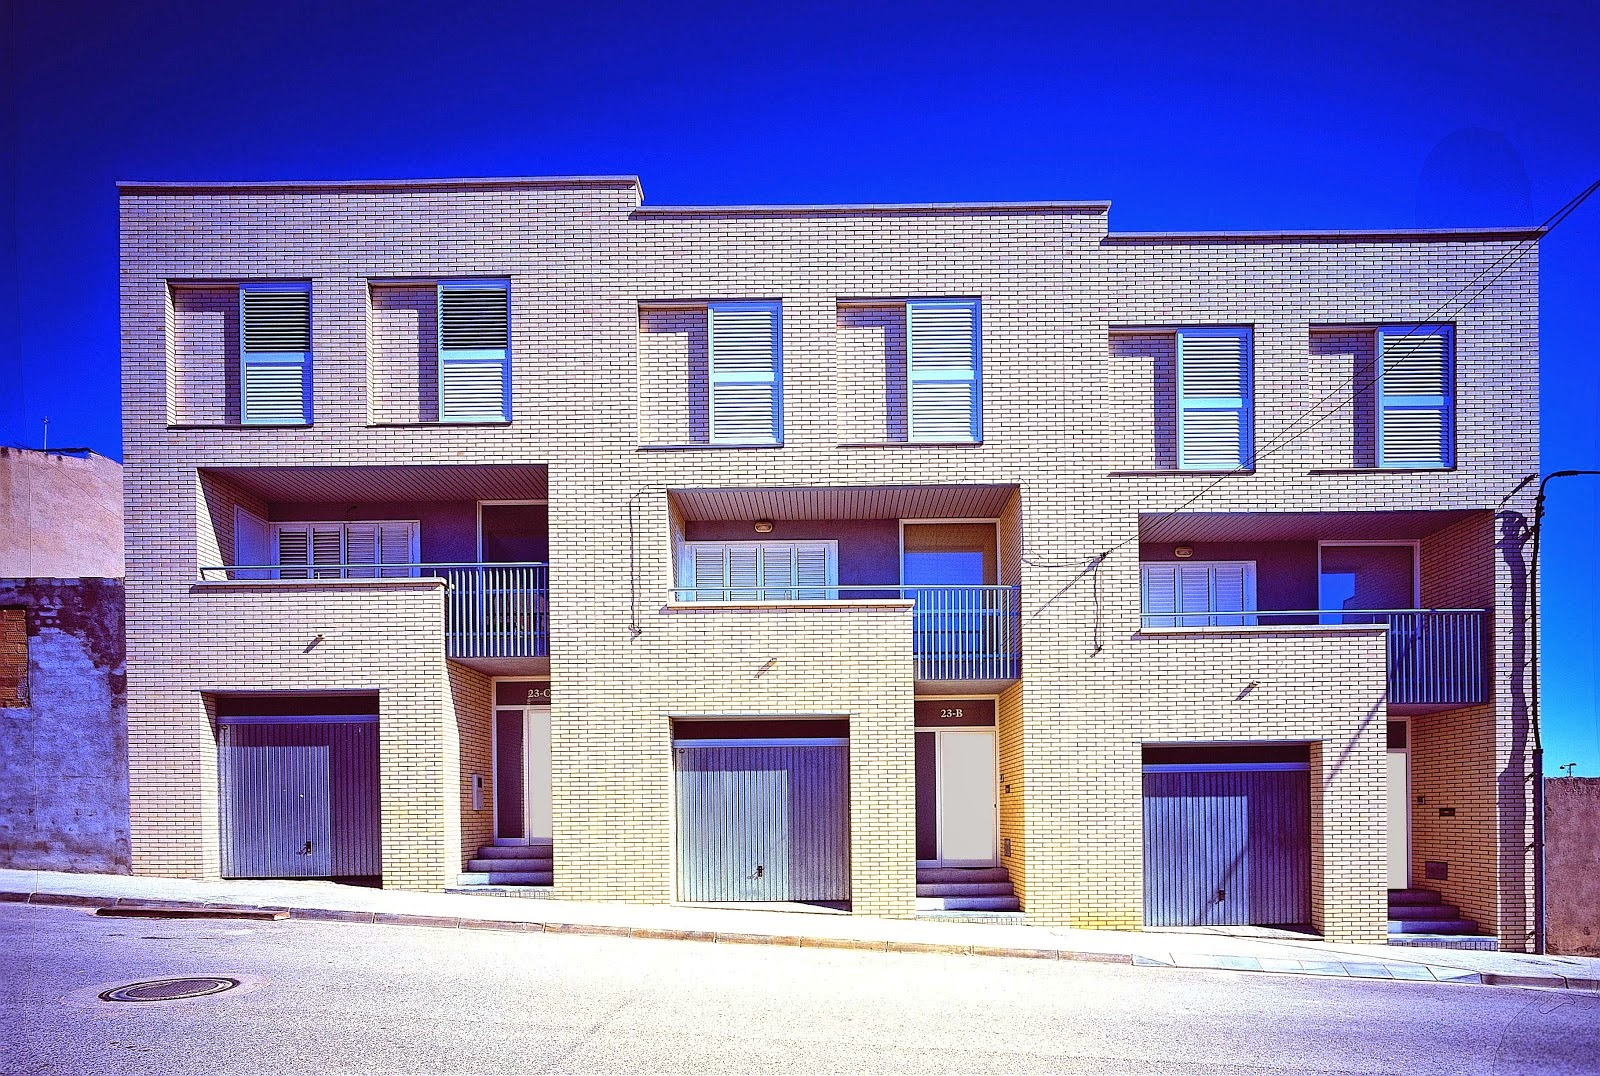 viviendas autoconstruidas I